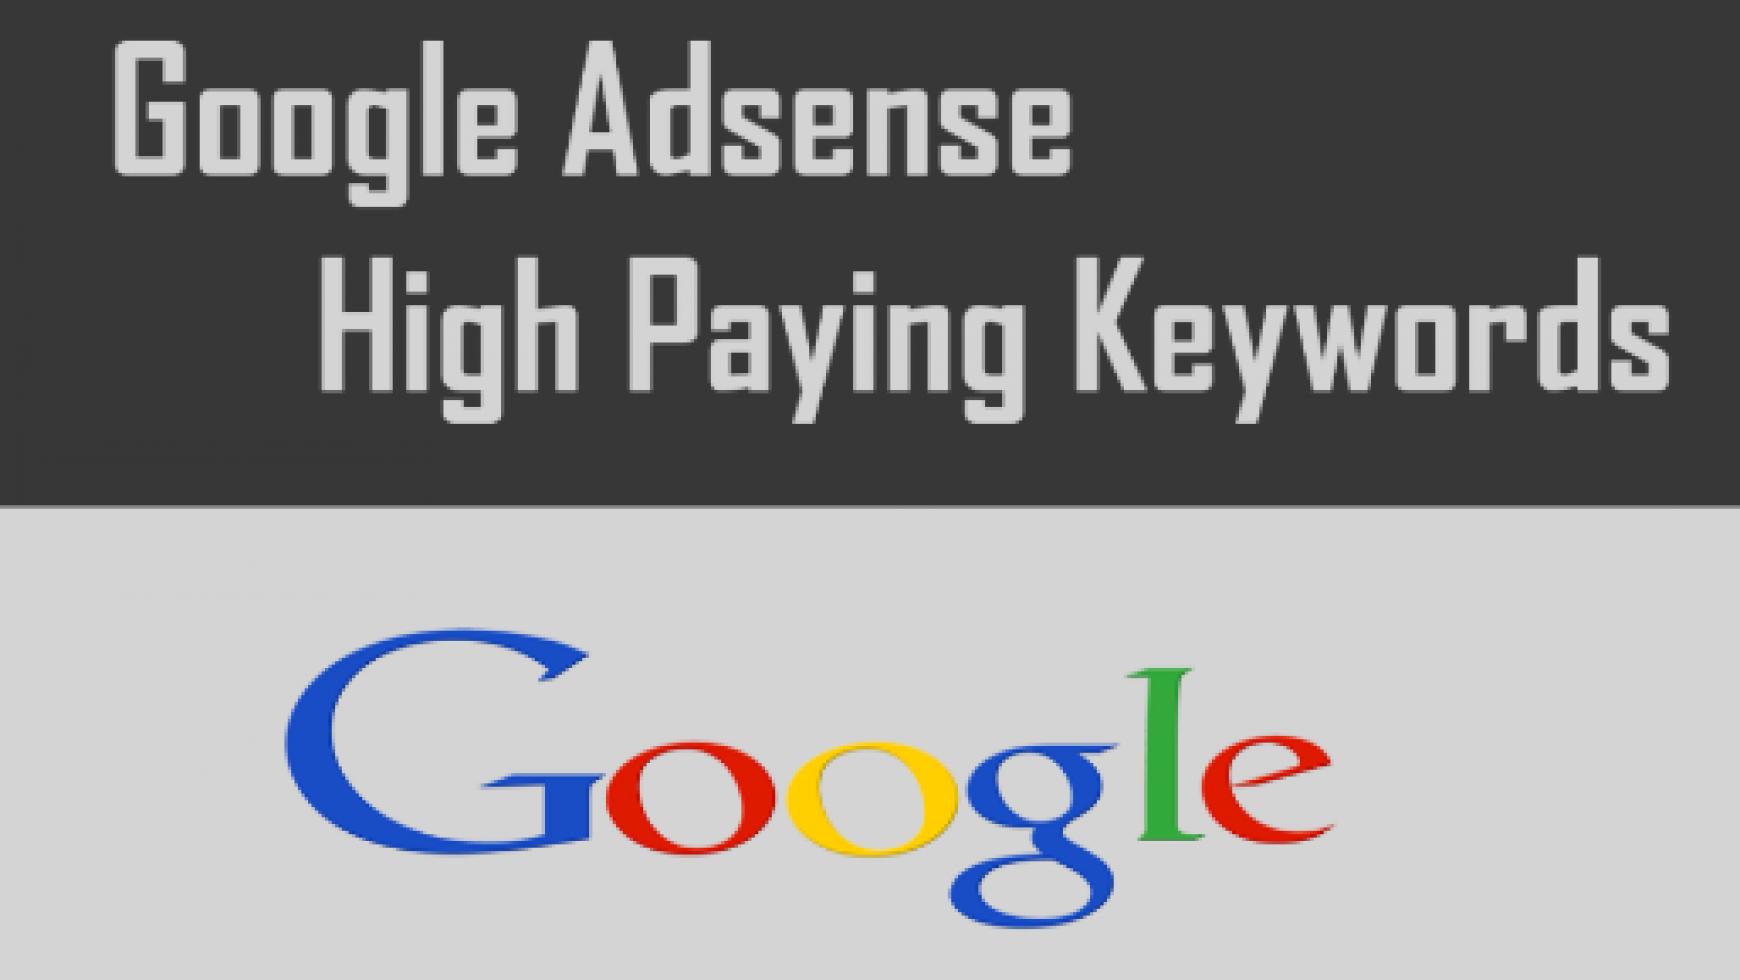 Top Paying Adsense Keywords List